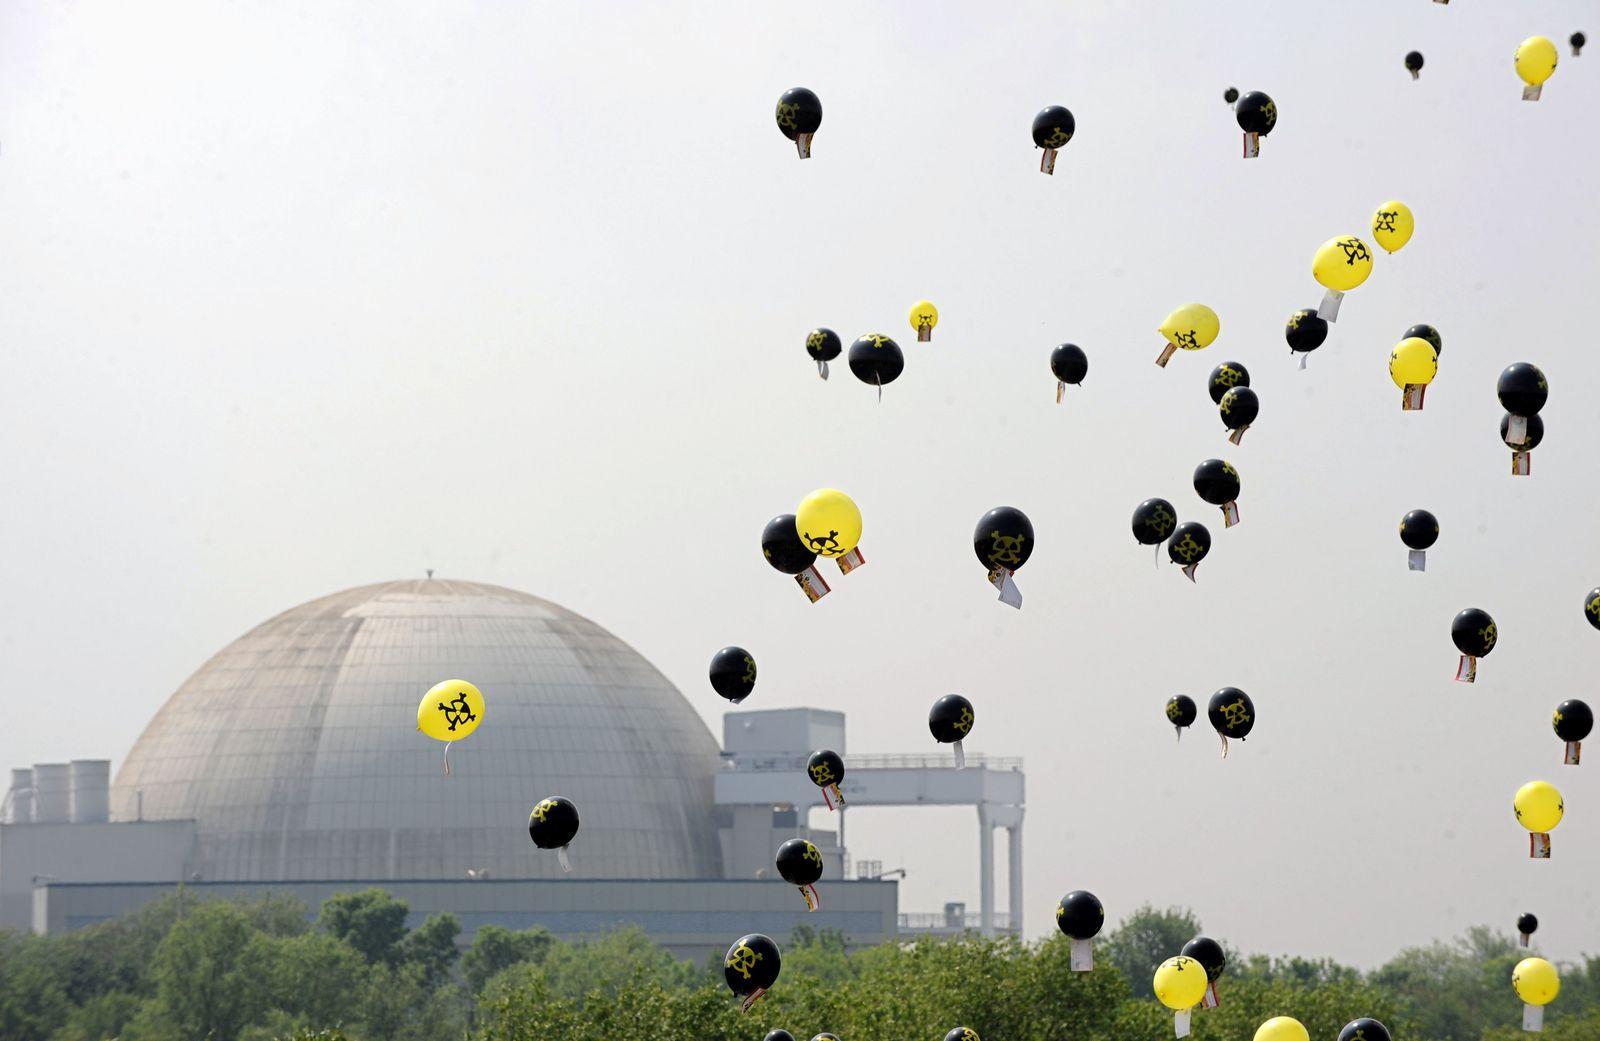 Protestballons vor Atomkraftwerk